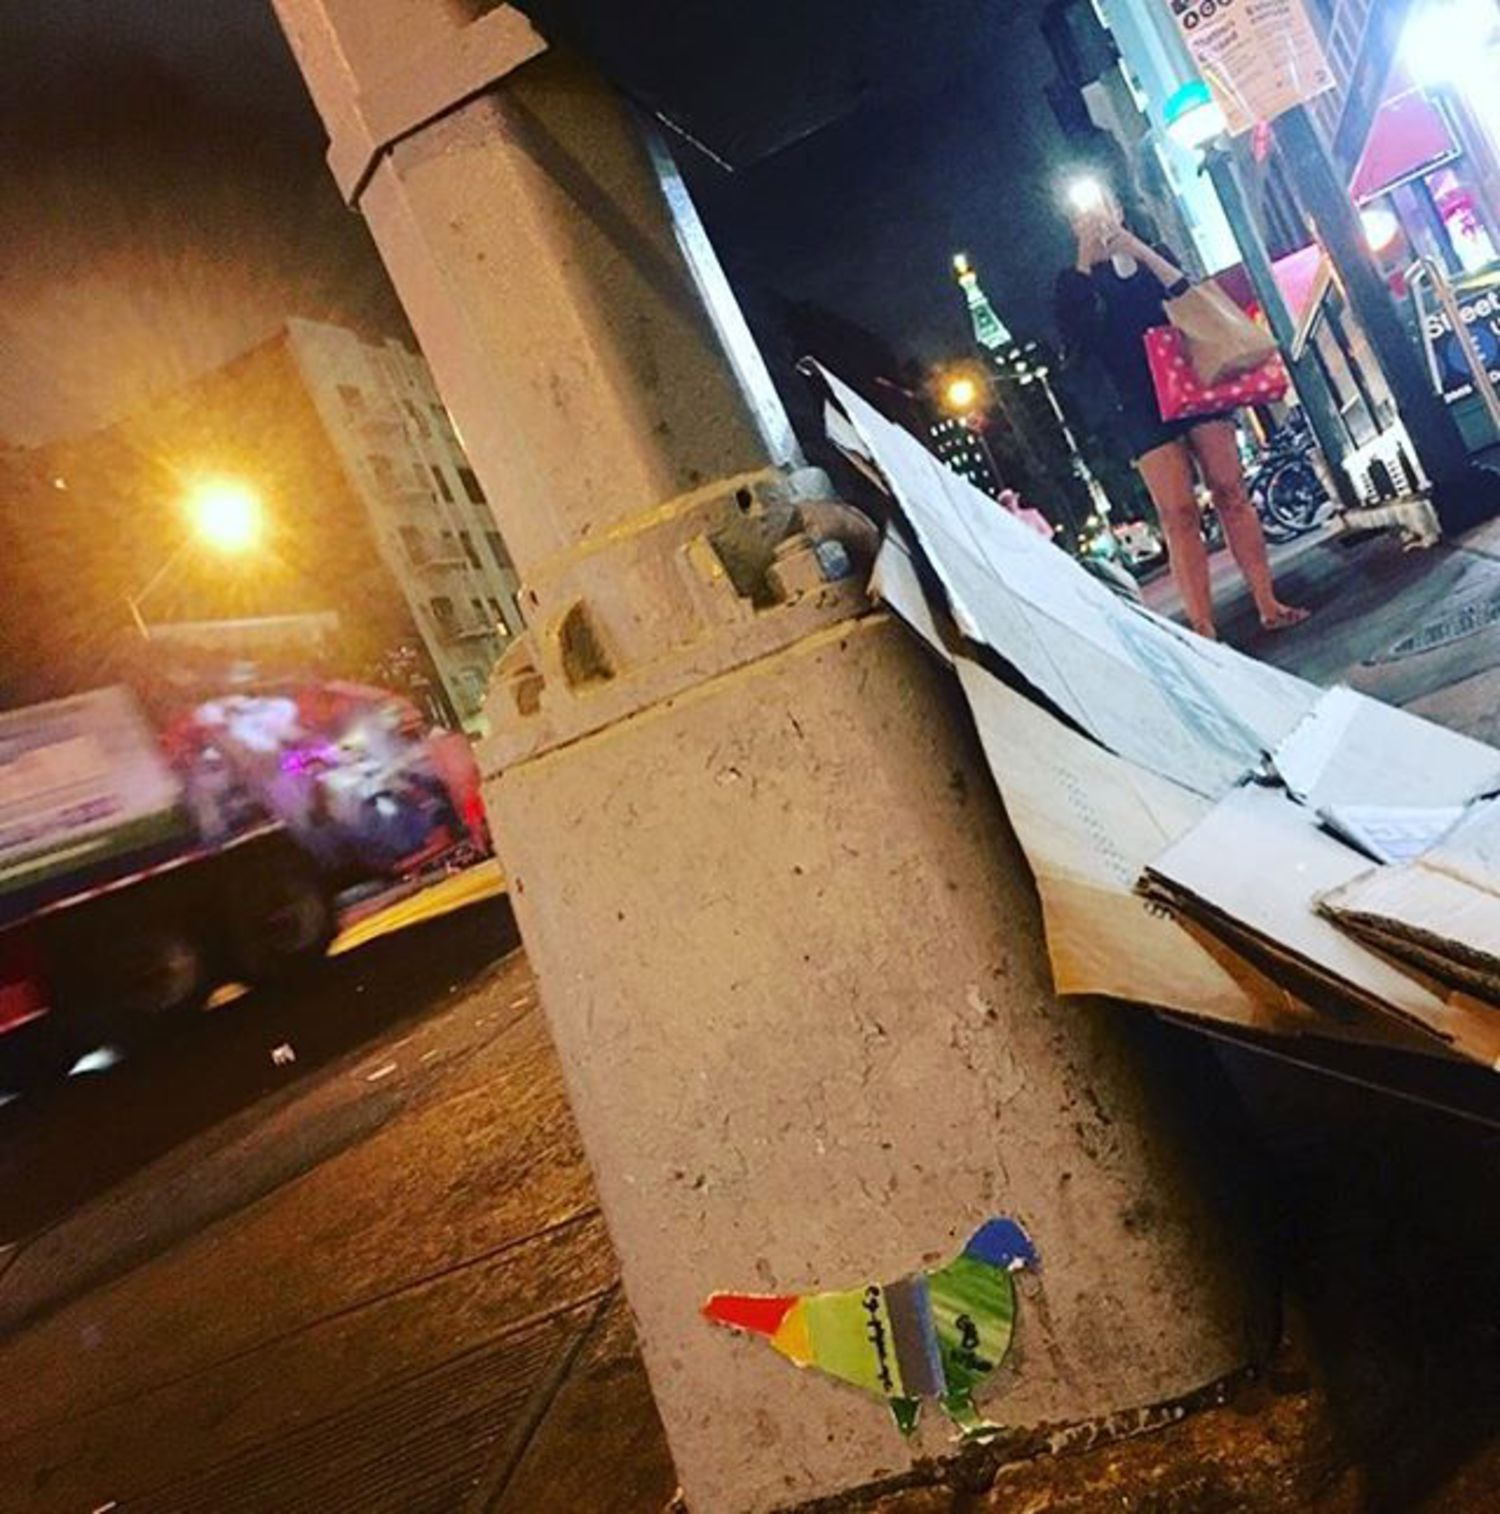 Pigeon 45 - W 23 St @ 8th Ave. #pigeon #chelsea #streetlight #uptown #etrain #streetart #paparazzi #original #glass #art #nyc #nycstreetart #grafitti #wheatpaste #thestreetsofnyc #streetlightpigeon #gbpigeonnyc #gbwashere